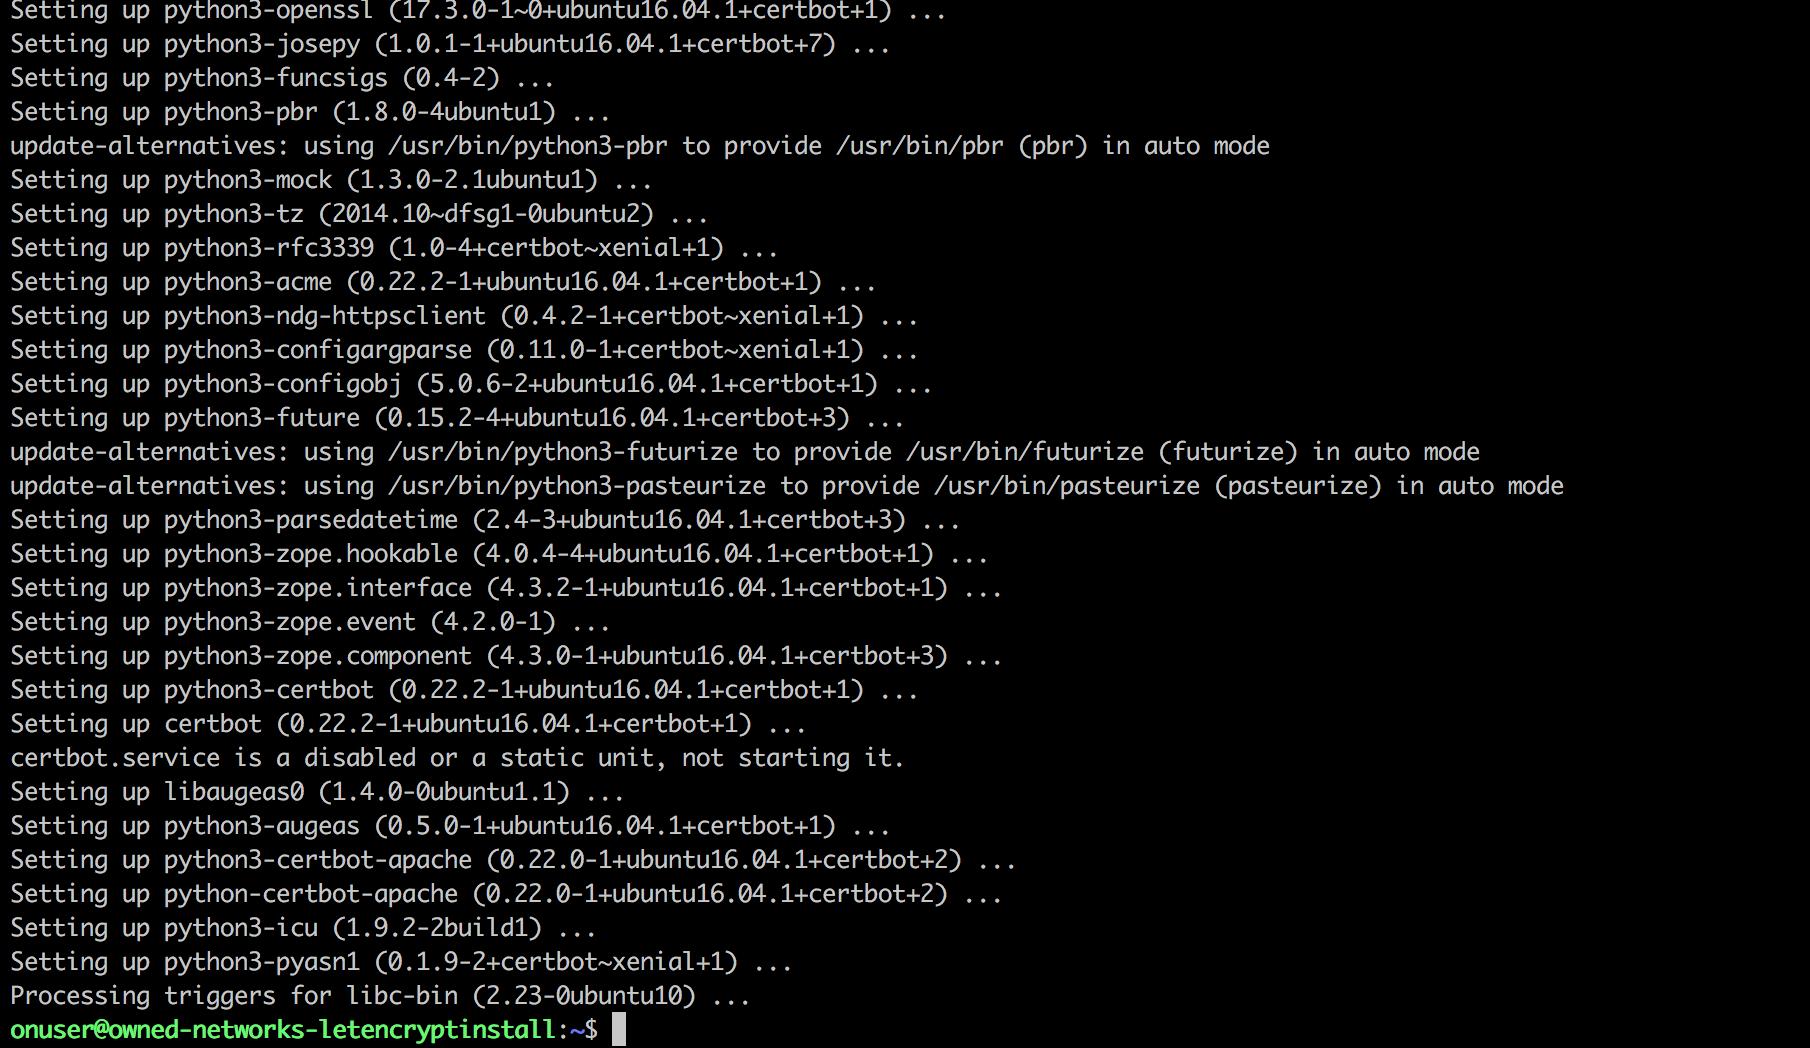 letsencypt apt-get install certbot on ubuntu